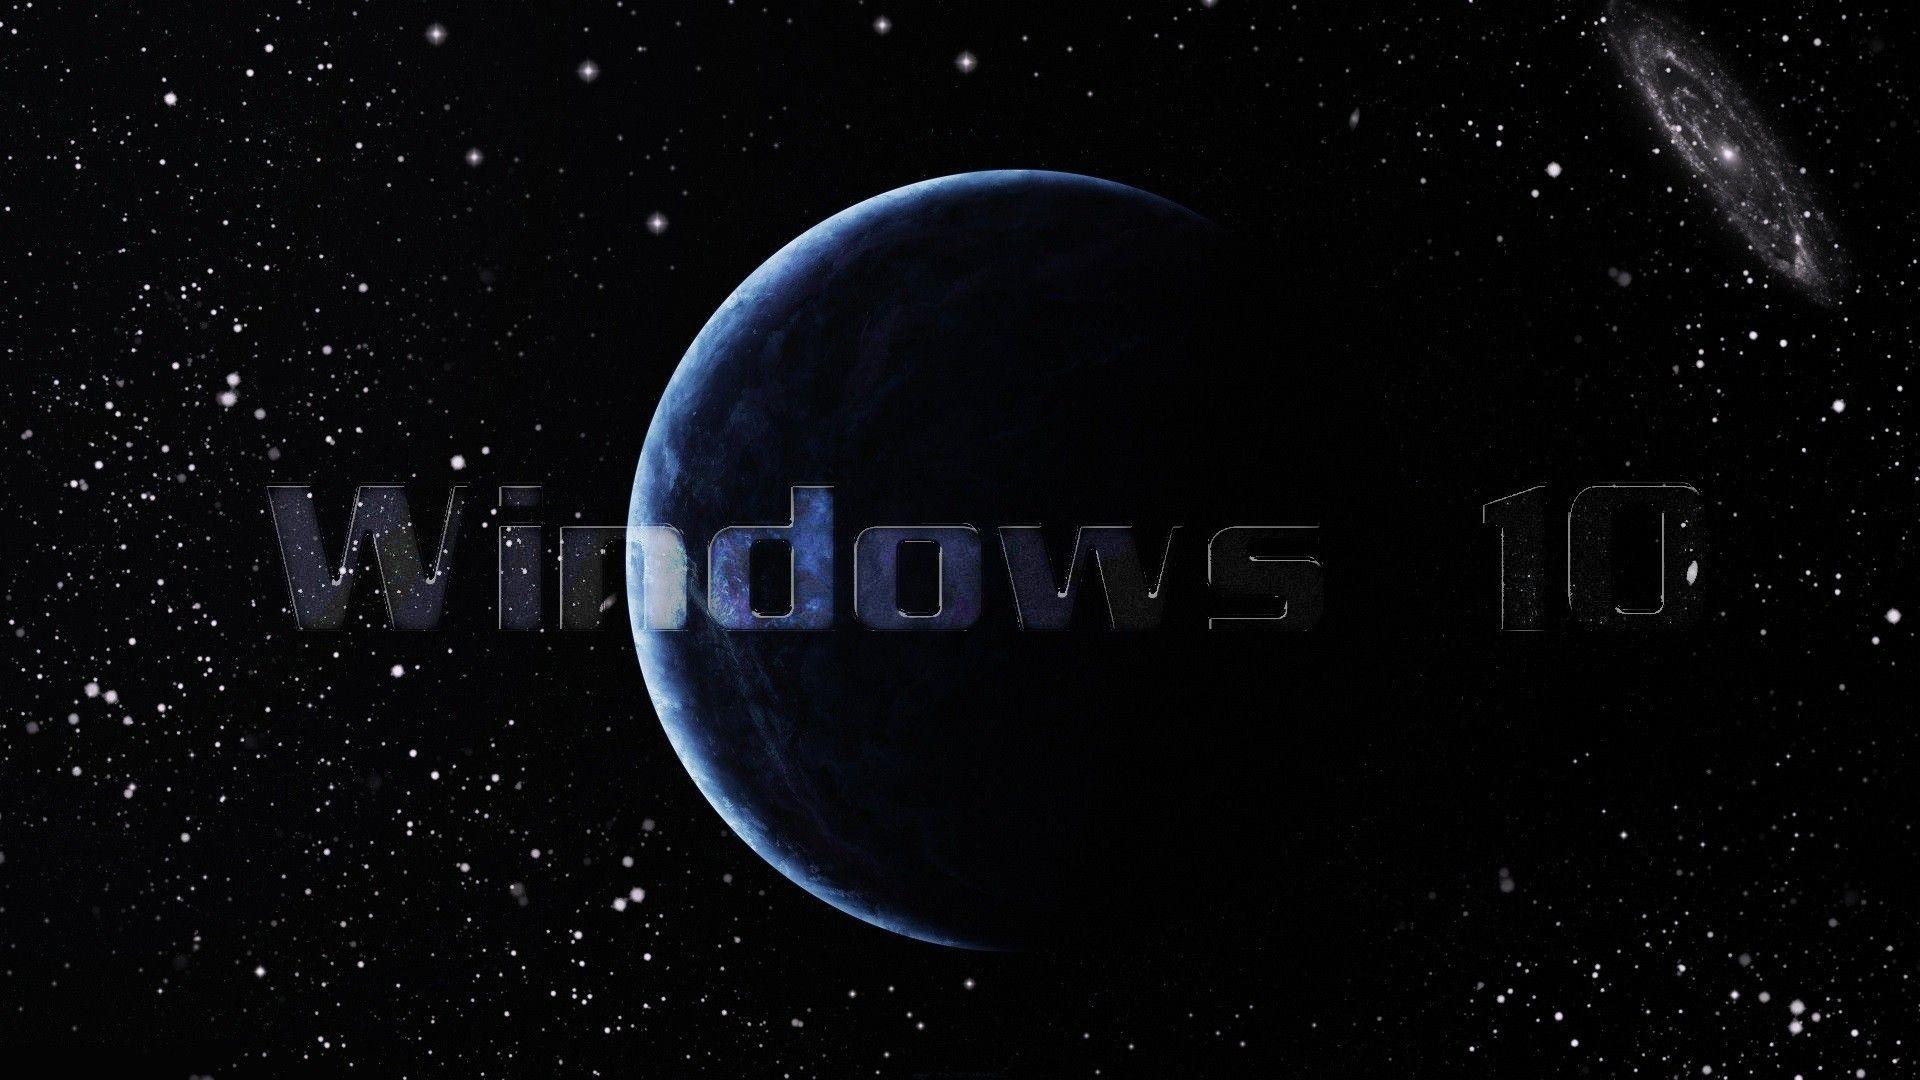 Windows 10 Galaxy wallpaper (1080p) – Wallpaper .